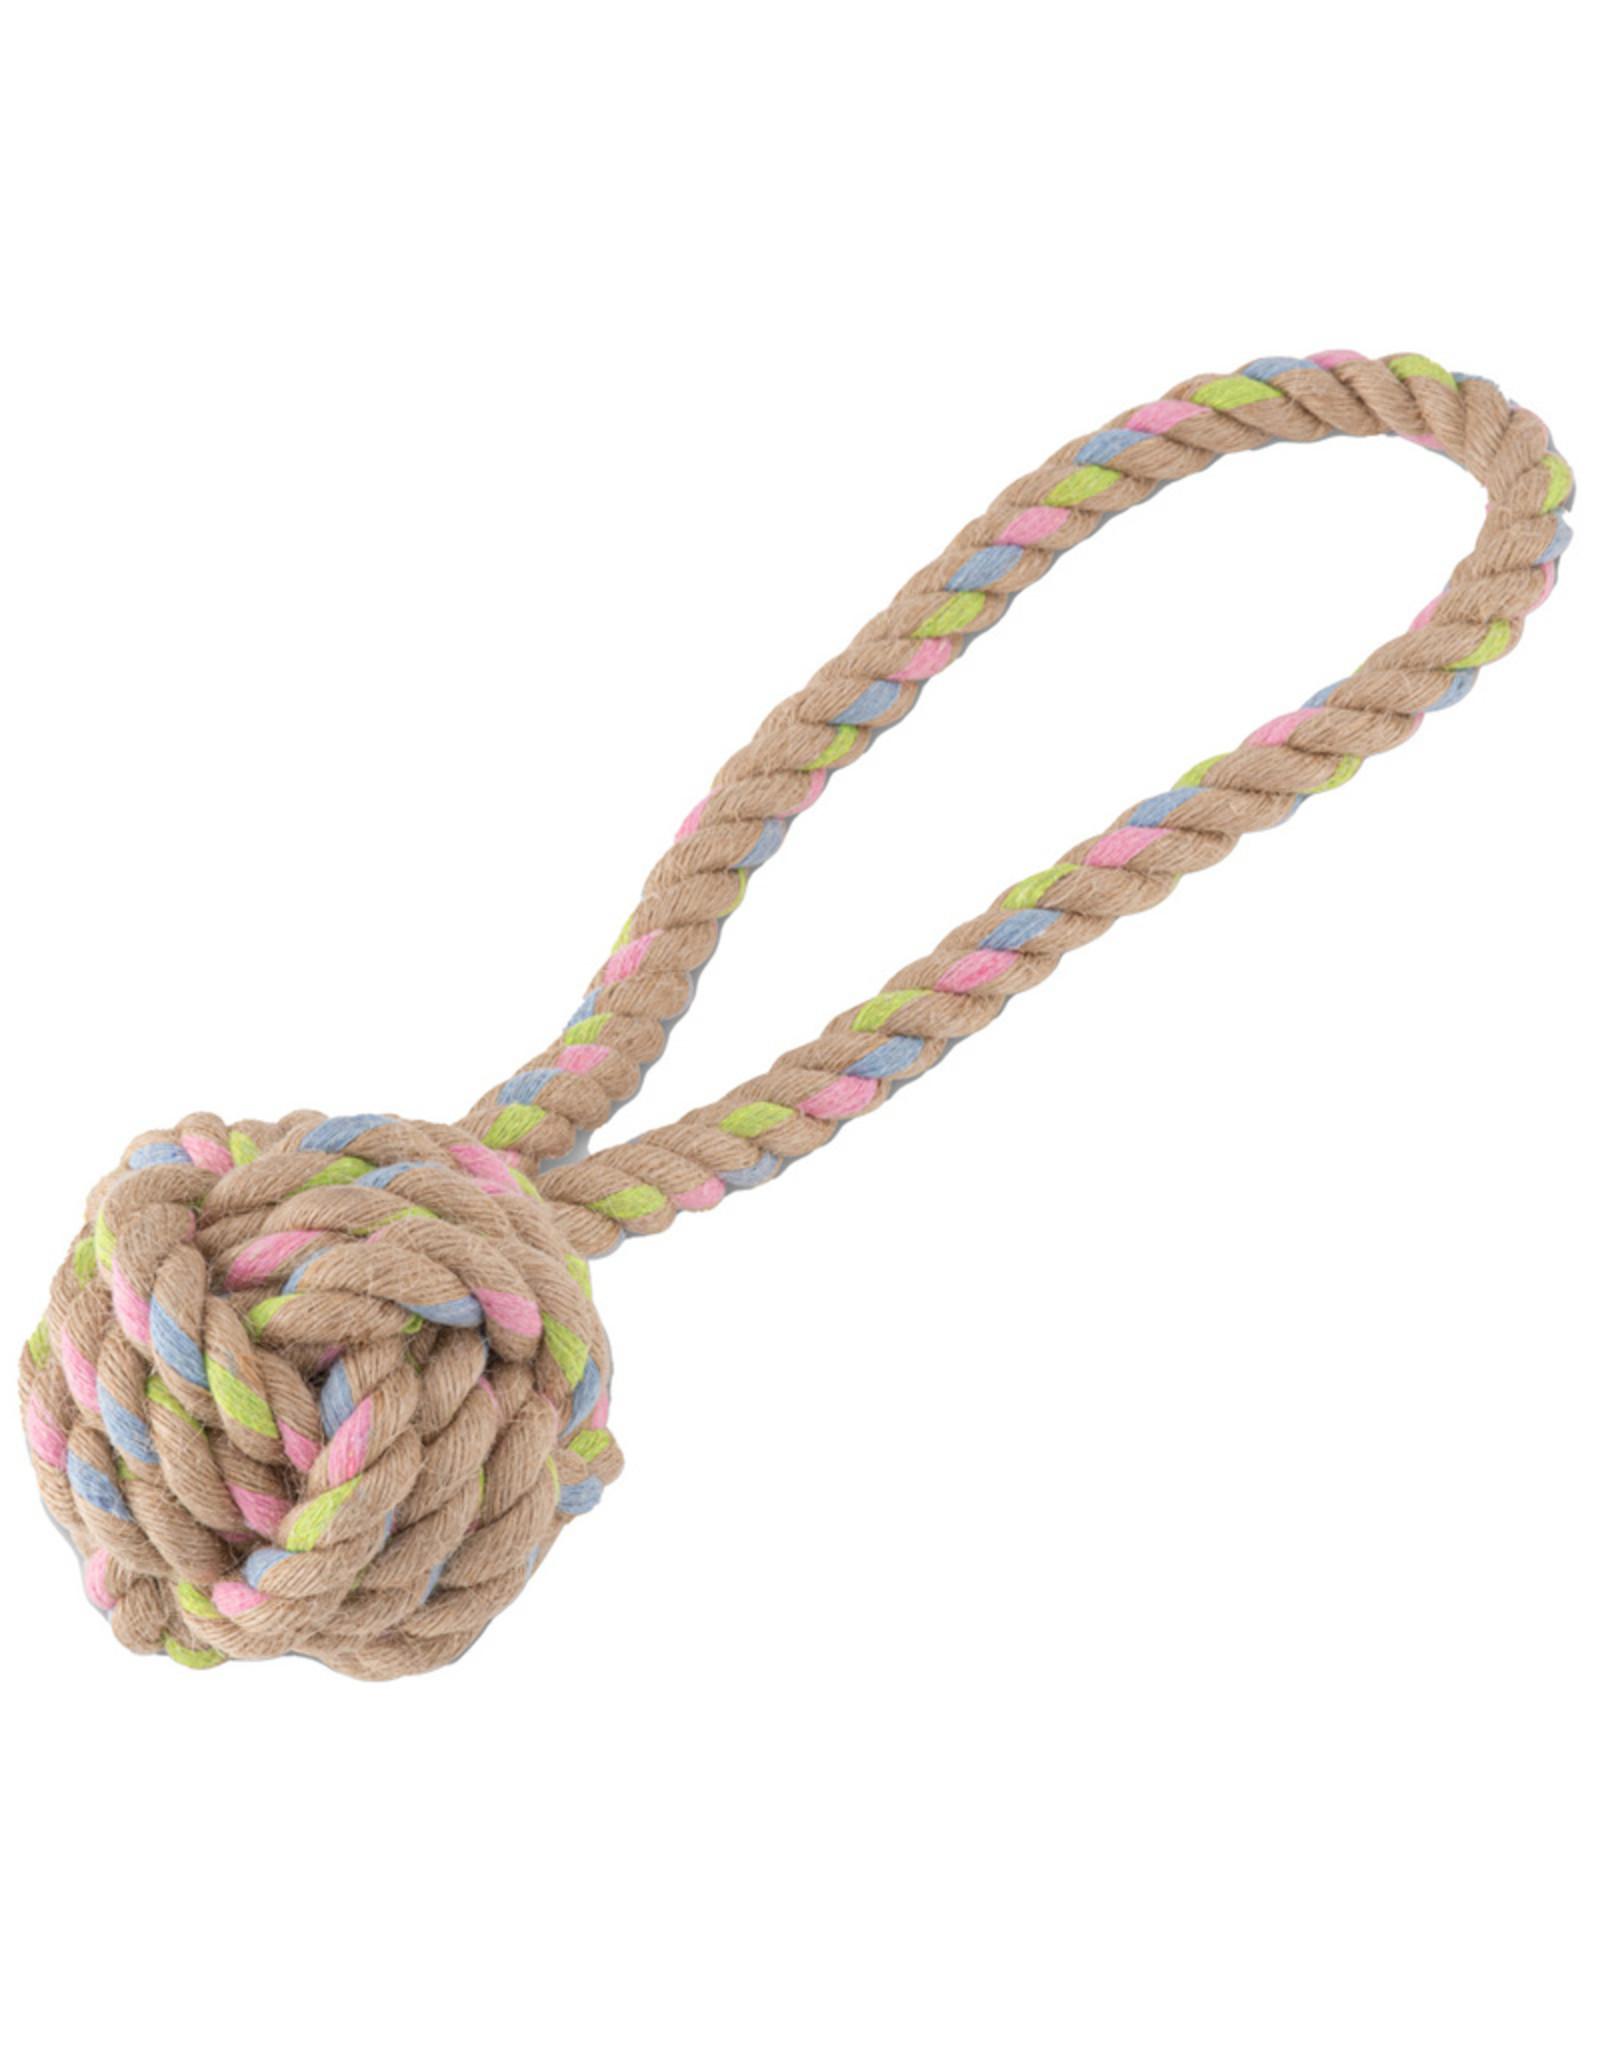 Beco pets Hemp - Ball with loop